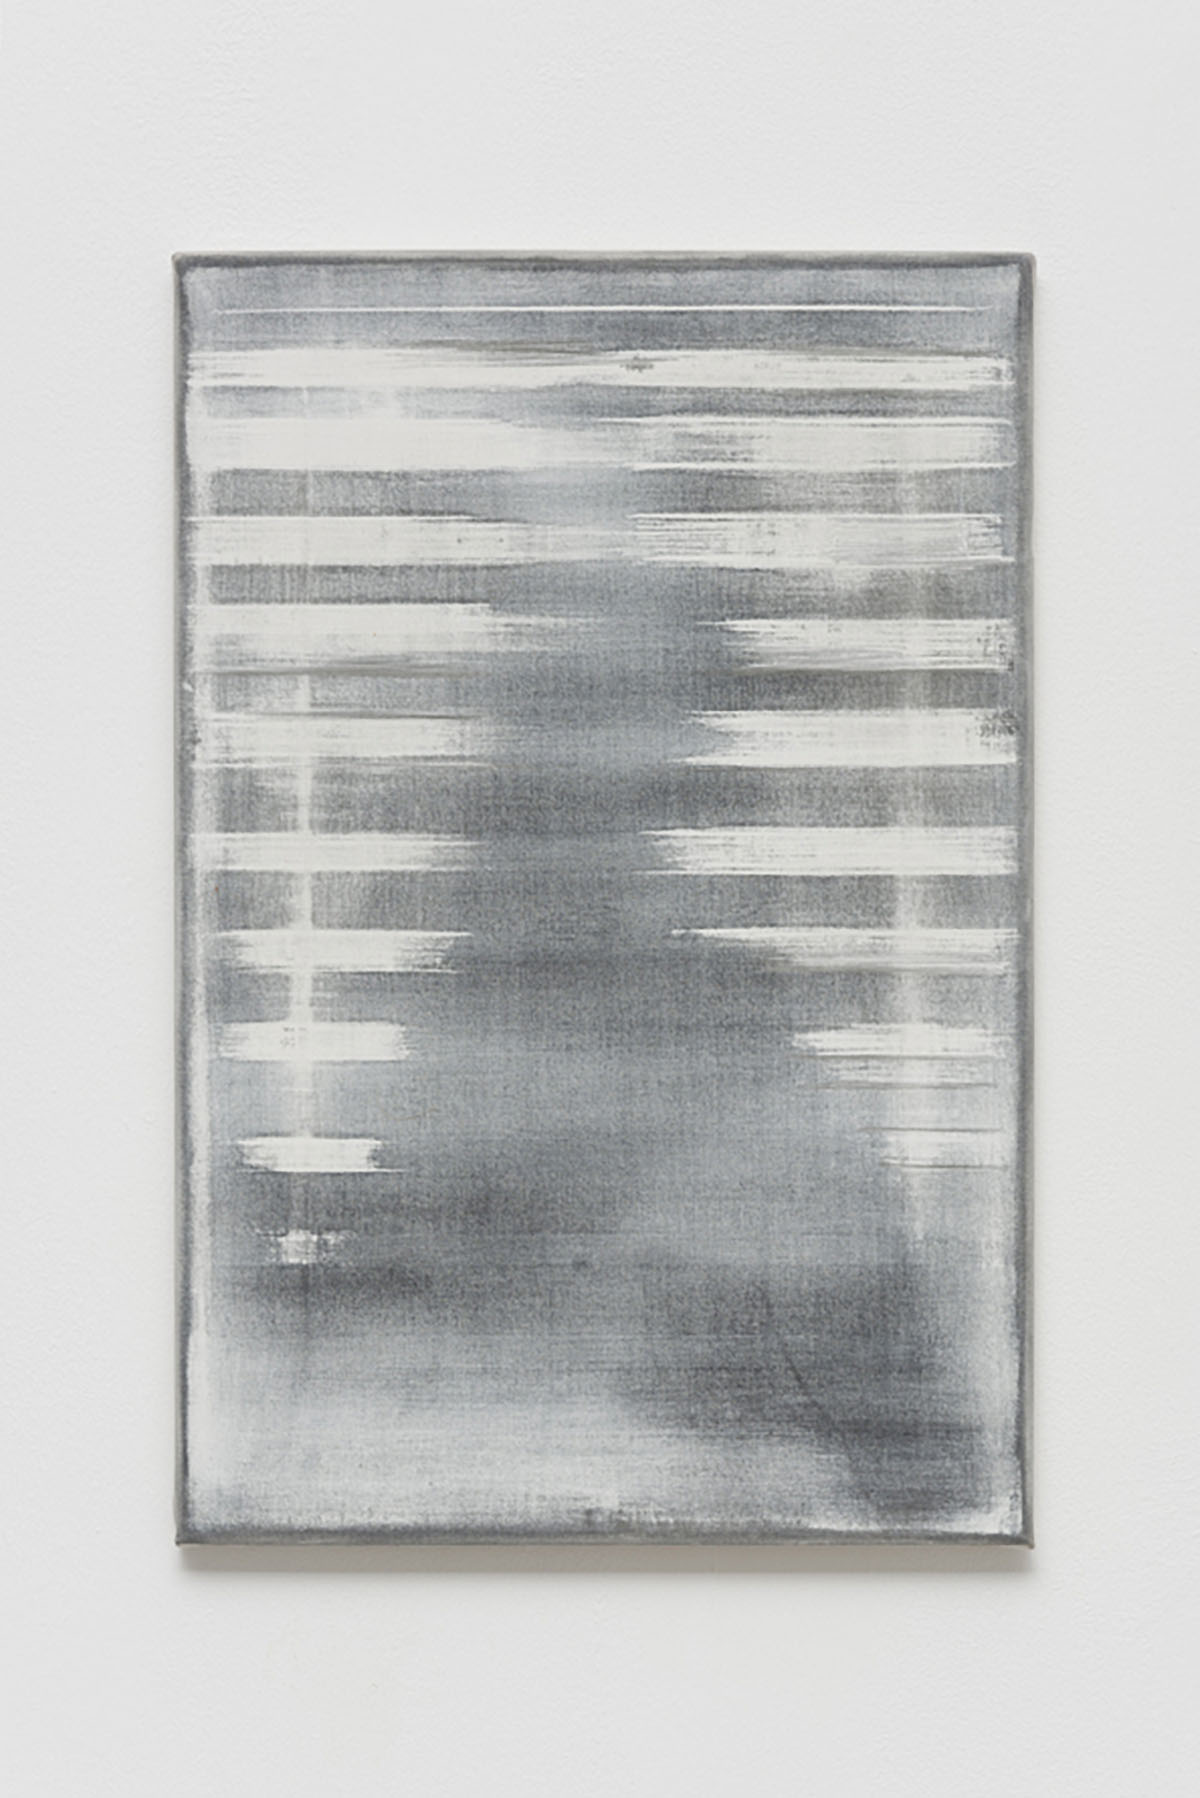 Marta Guisande | Untitled | 2020 | Mixed media on cotton | 60 x 40 cm | Courtesy Marta Guisande & kajetan Berlin | Photo: Marcus Schneider